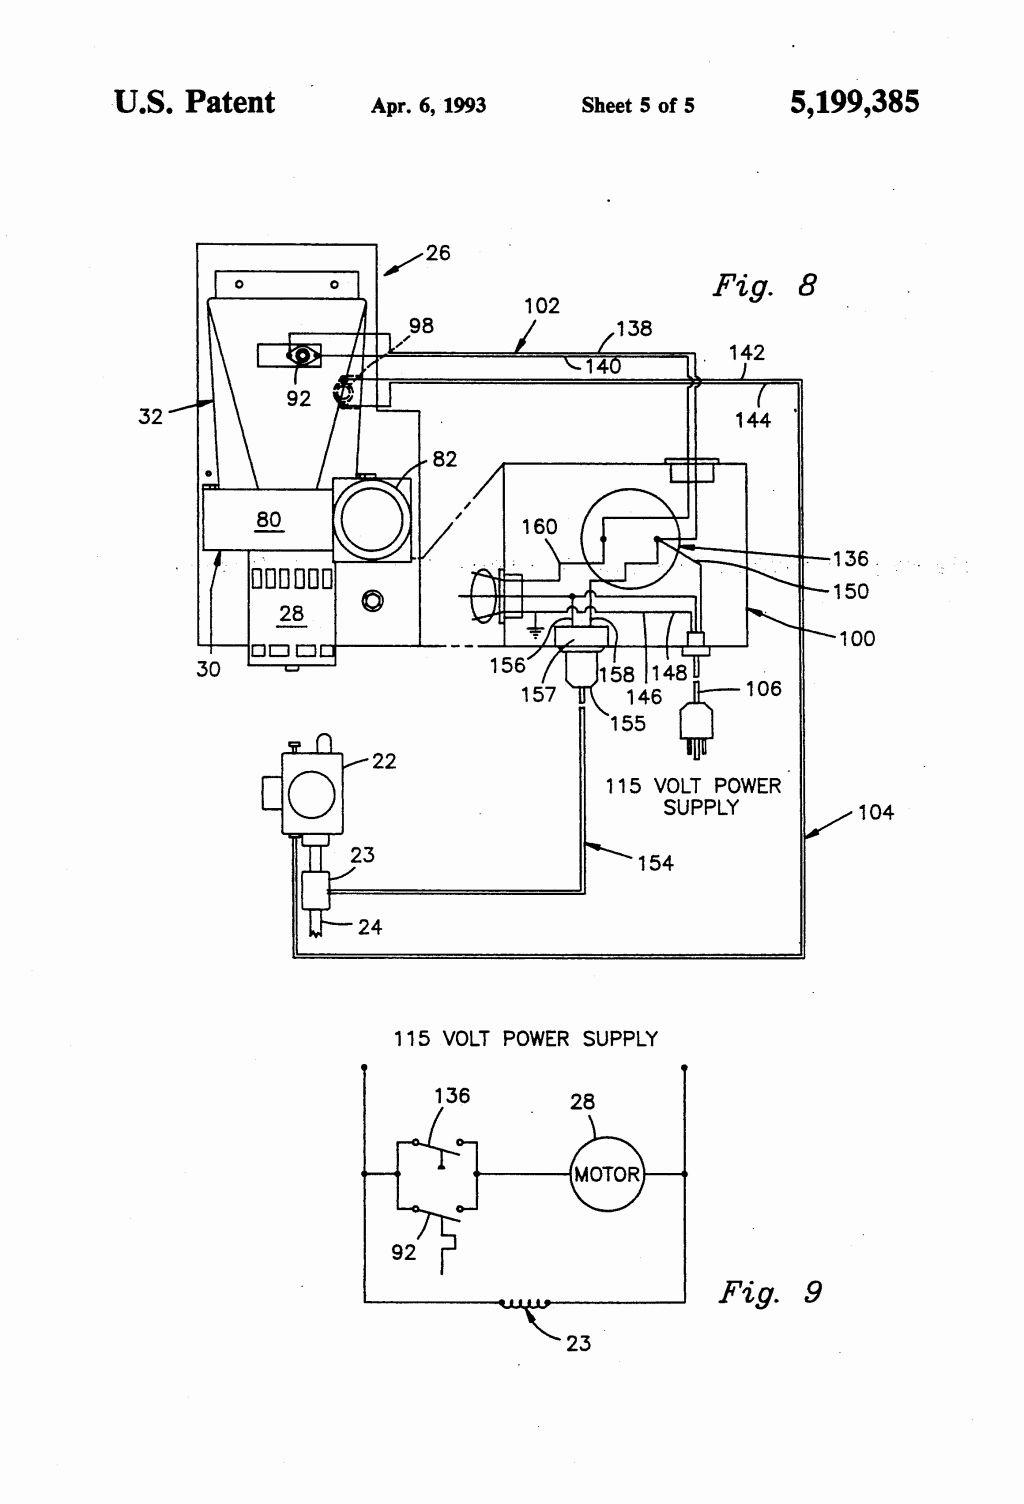 Electric Heater Wiring Diagram Symbol